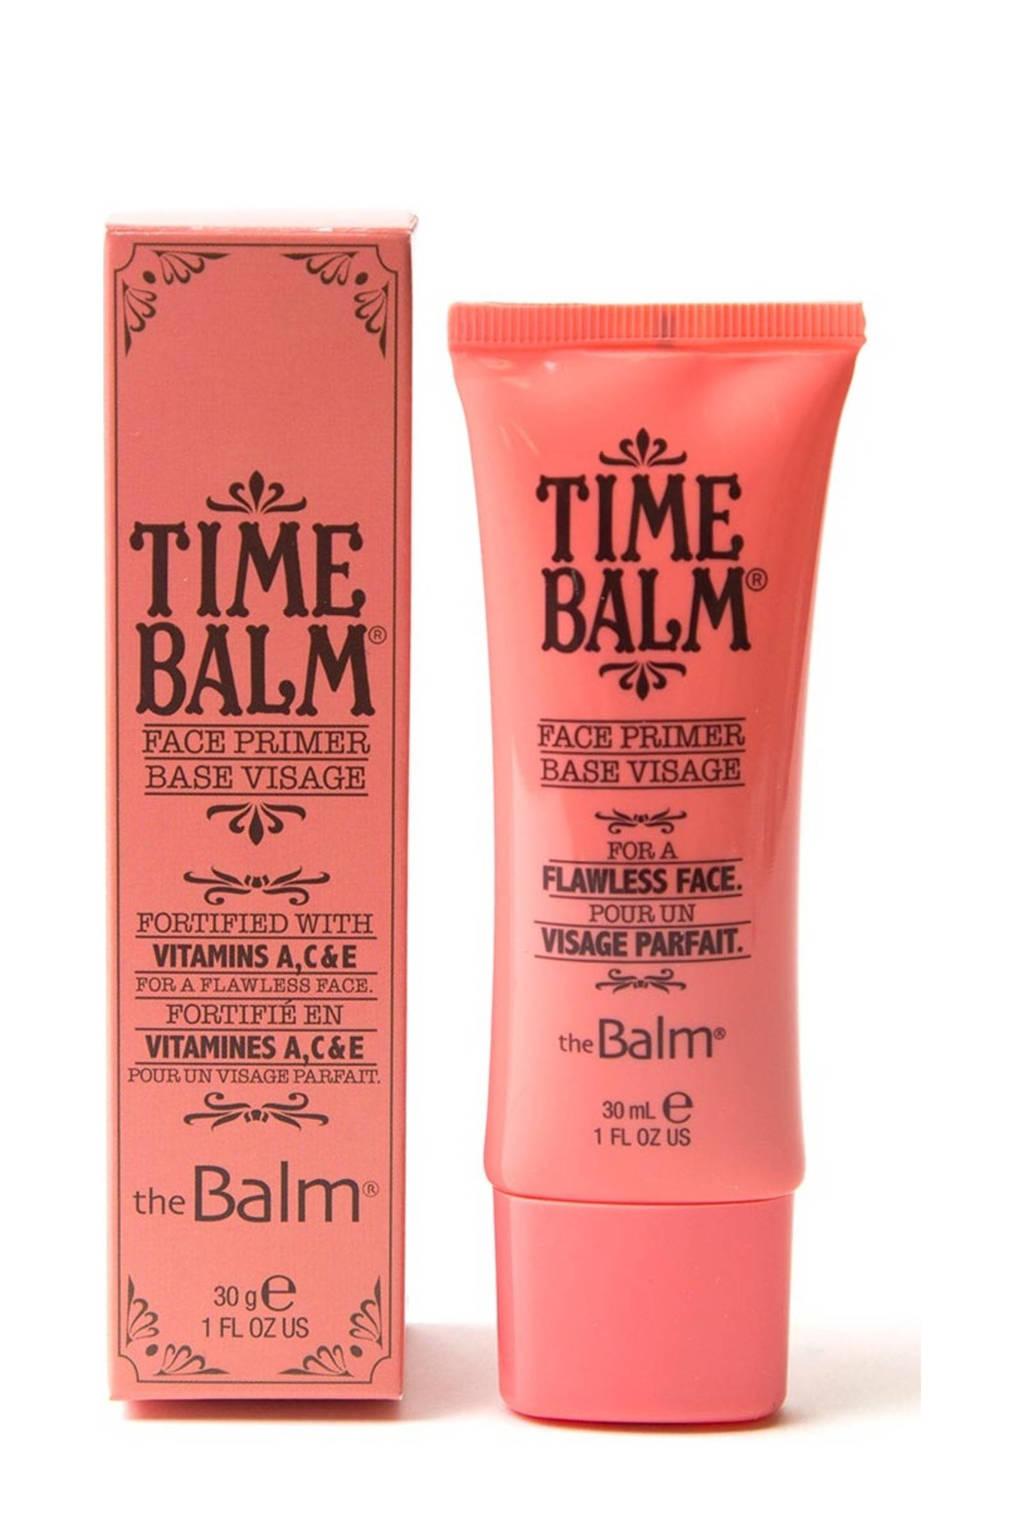 The Balm timeBalm gezichtsprimer, face primer